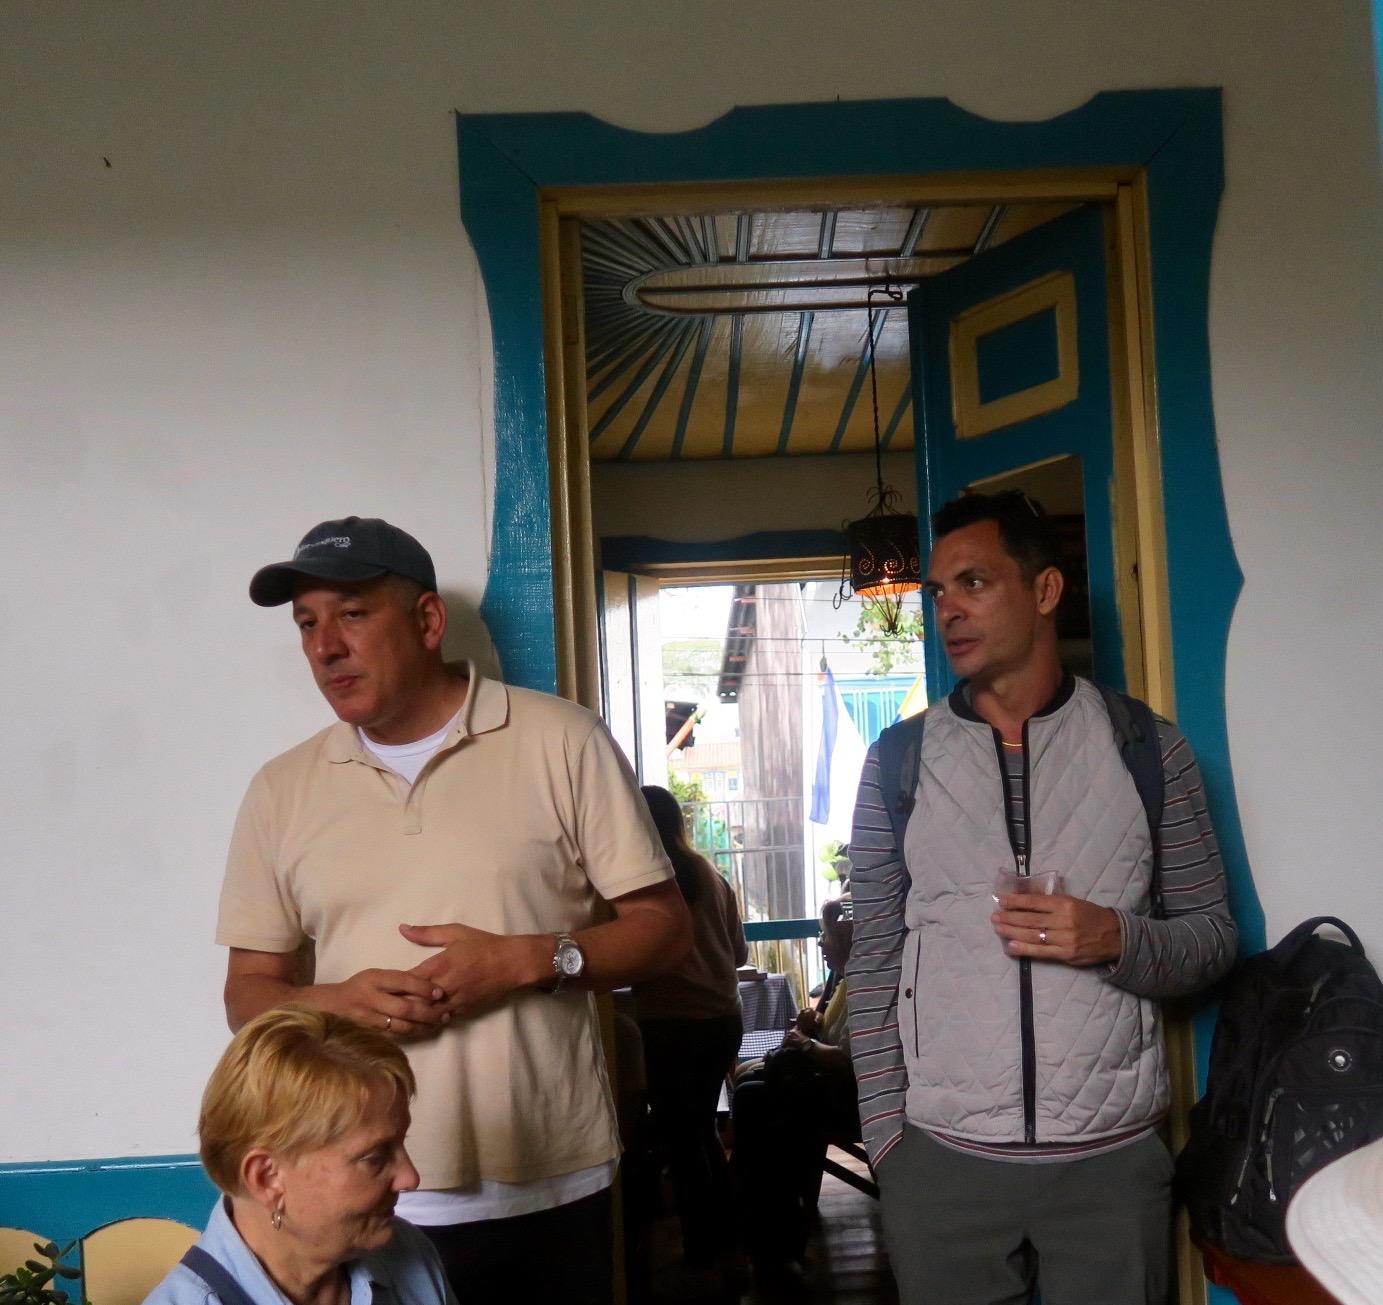 Jesus Martin & Andres Fernandez